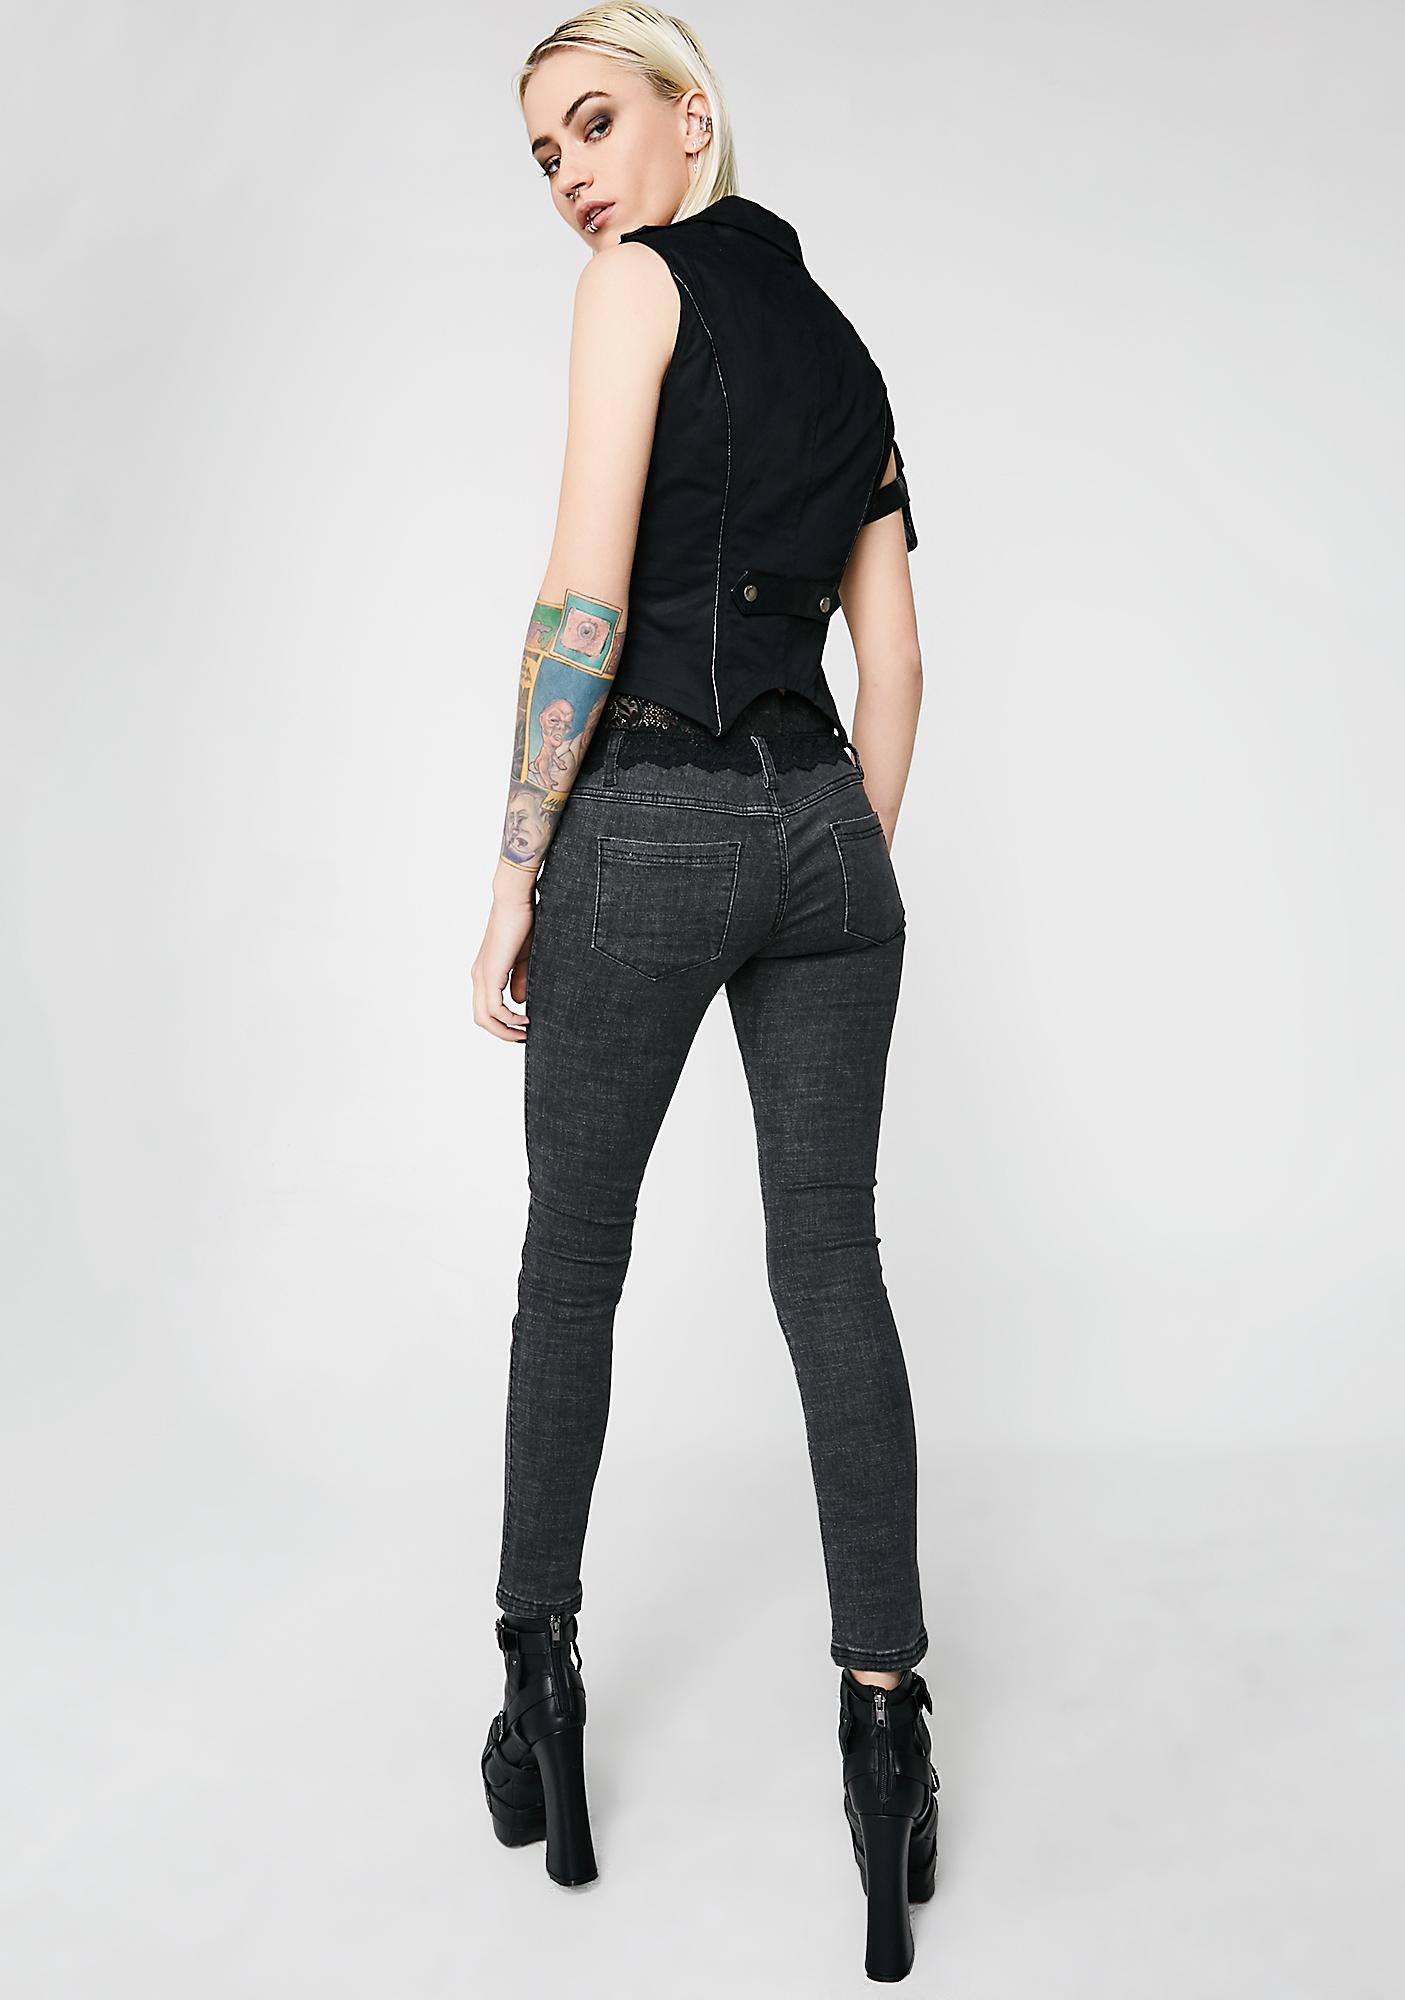 Punk Rave Lace Denim Matching Leg Jeans